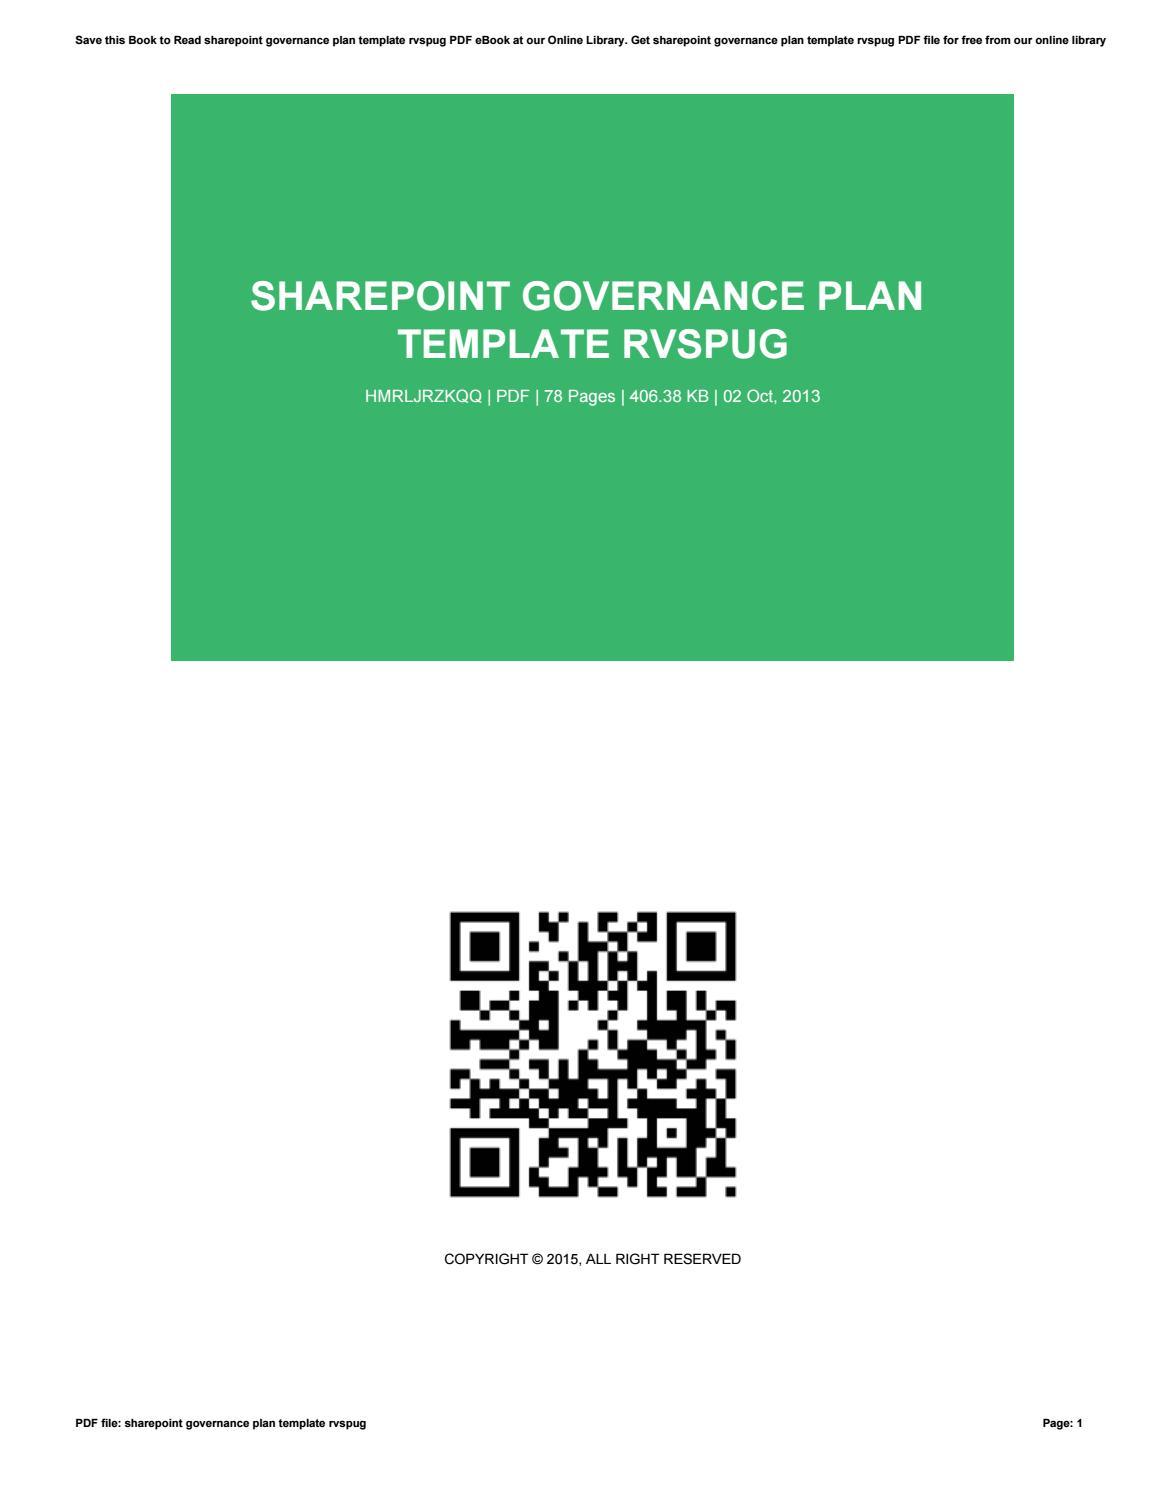 Sharepoint governance plan template rvspug by BarbaraSorensen1876 ...